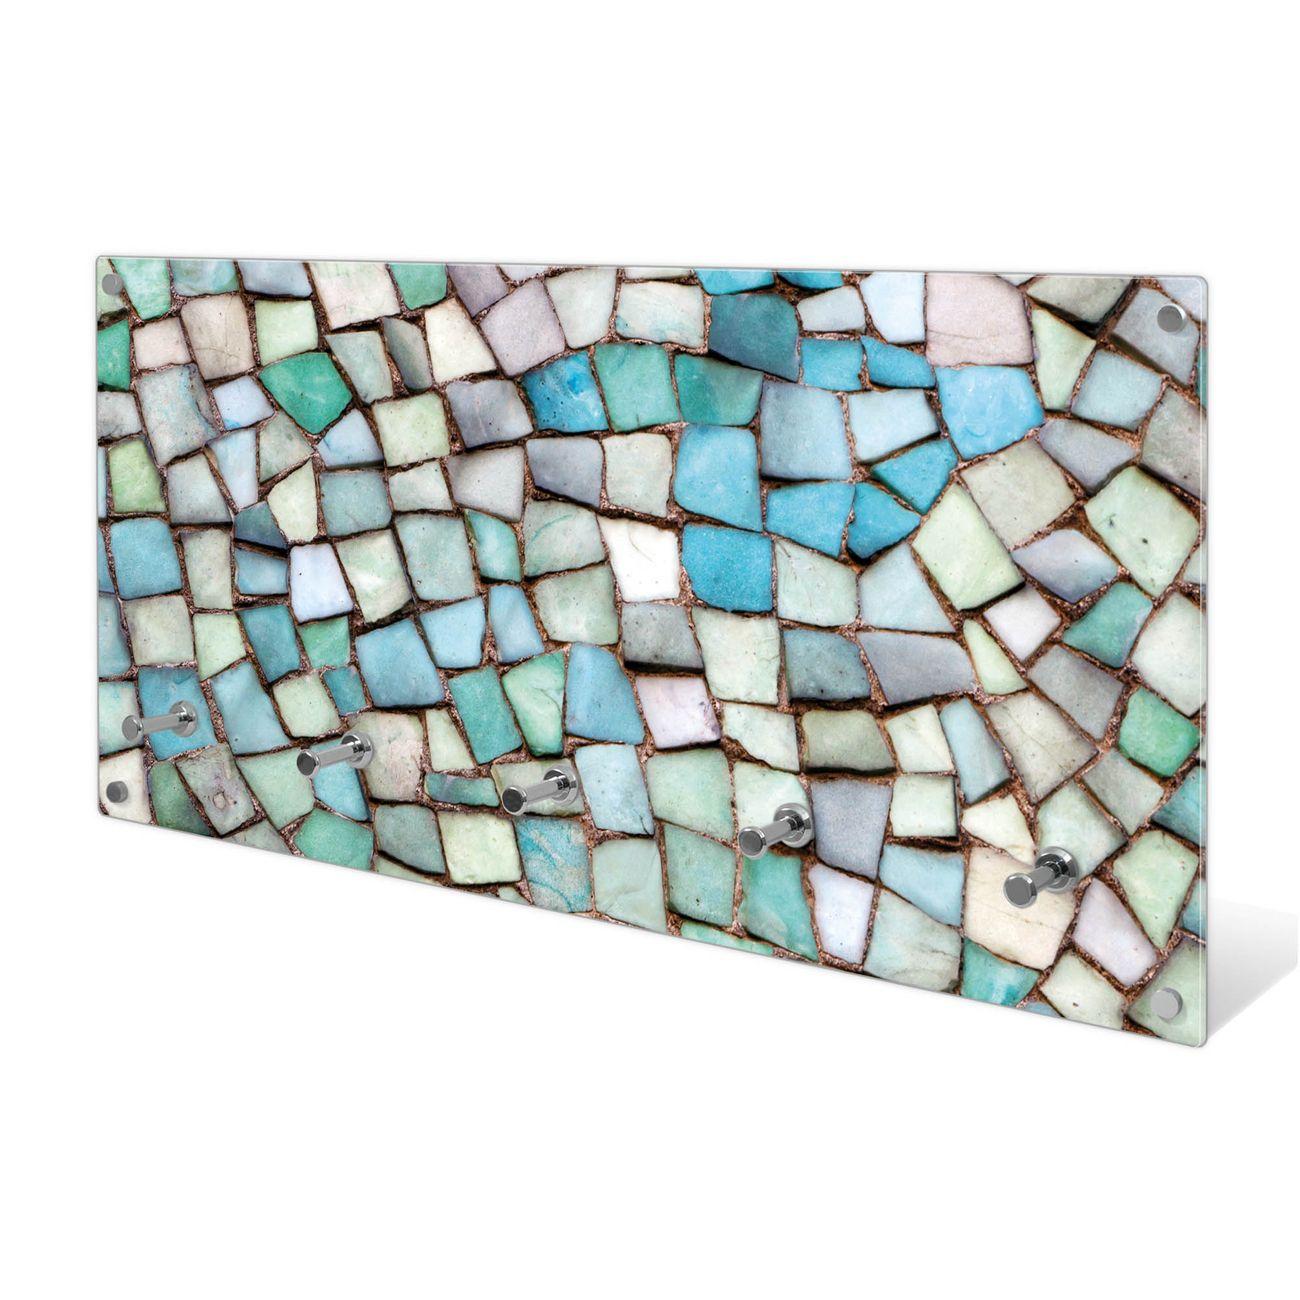 Garderobe aus Glas Motiv Mosaik Blau